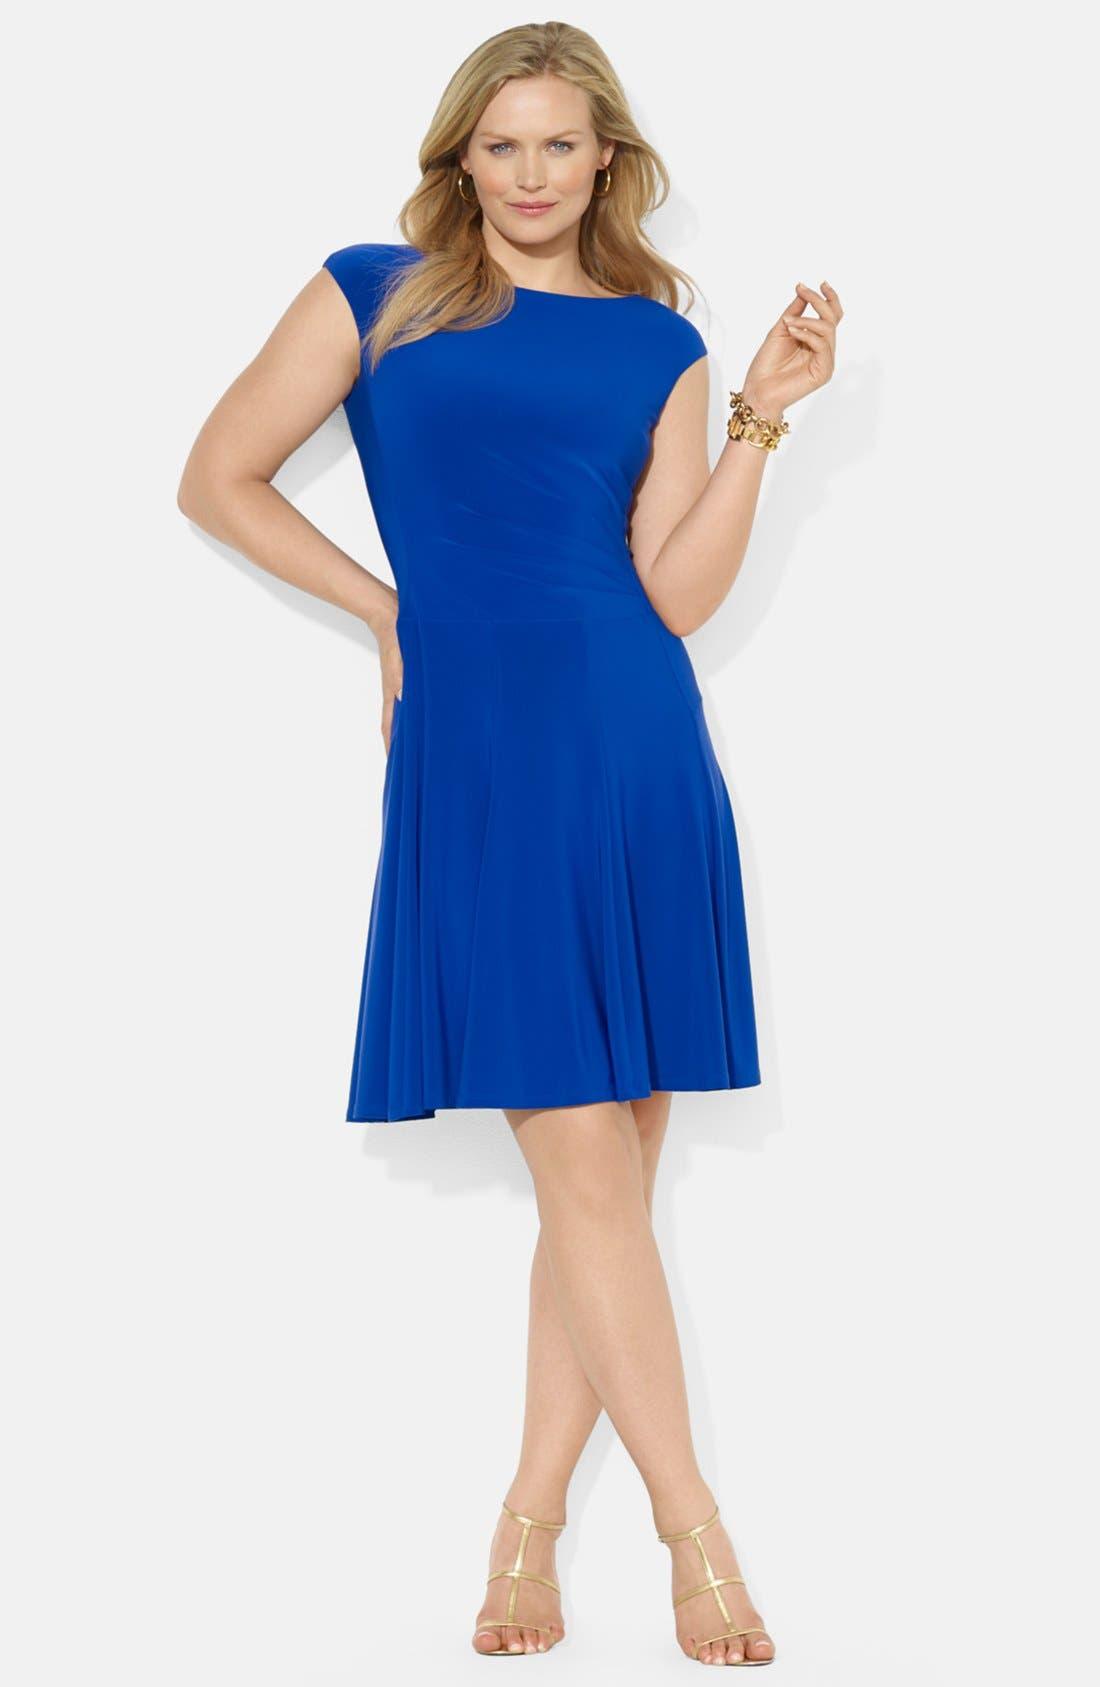 Alternate Image 1 Selected - Lauren Ralph Lauren Boat Neck Stretch Jersey Dress (Plus Size)